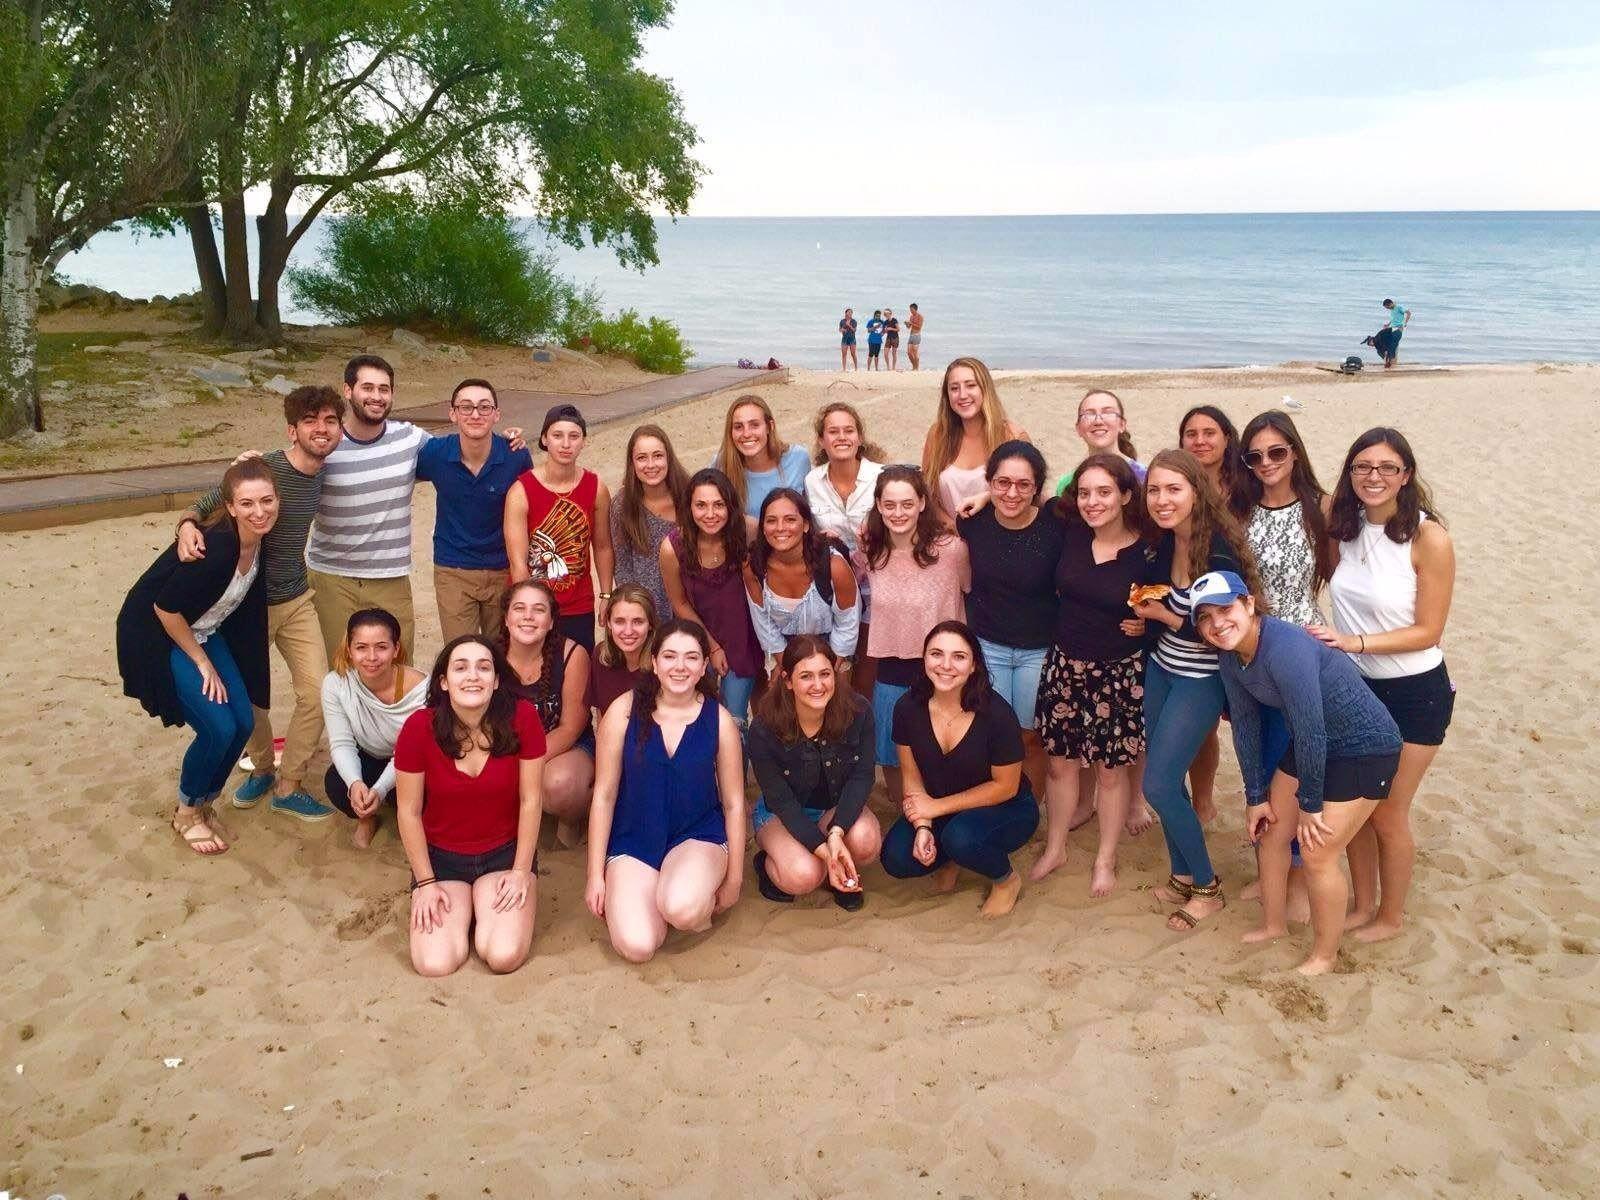 Jewish students of Loyola University Chicago